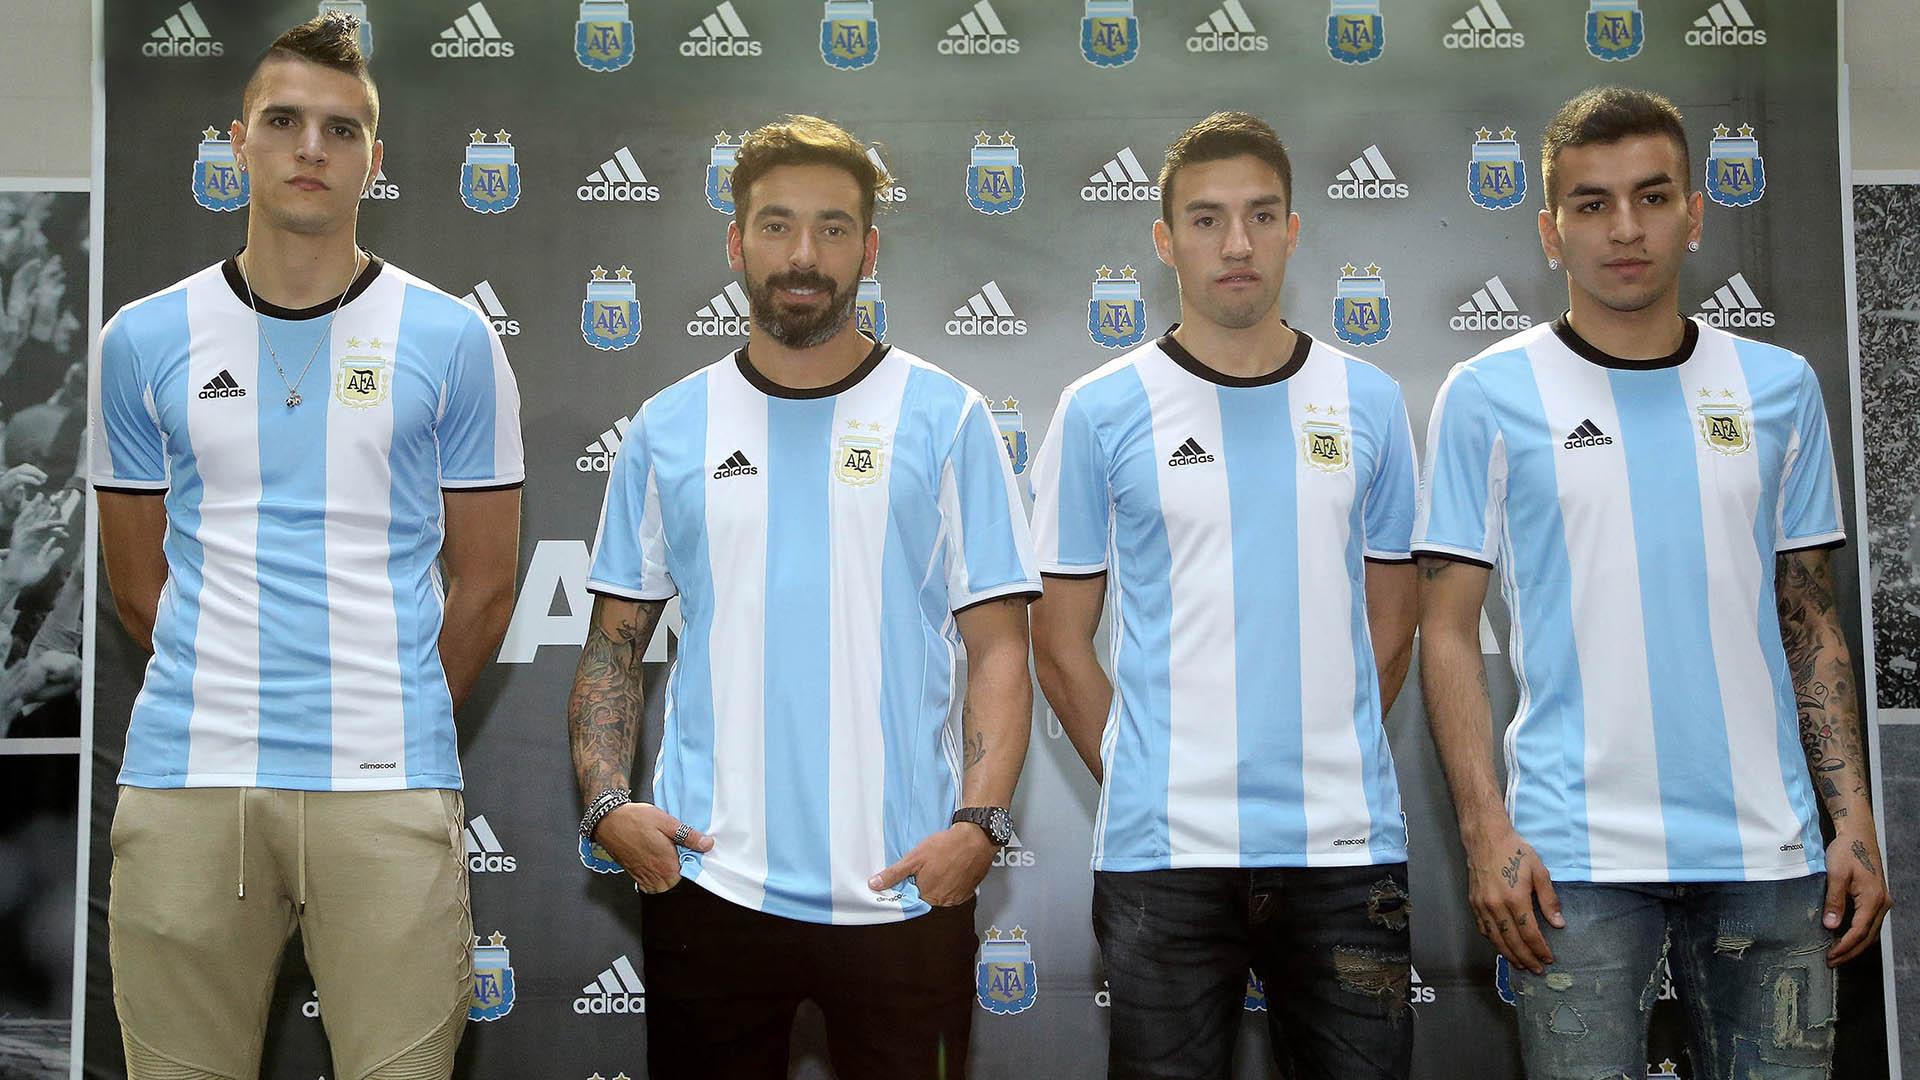 Yükle (1600x900)DLS 16 Mod Argentina De LujoDLS 16 Mod Argentina De Lujo. Adidas  Juventus Home 2015 2016 Mens Soccer Jersey - Men  s Soccer 5084960 Online bf26438e3